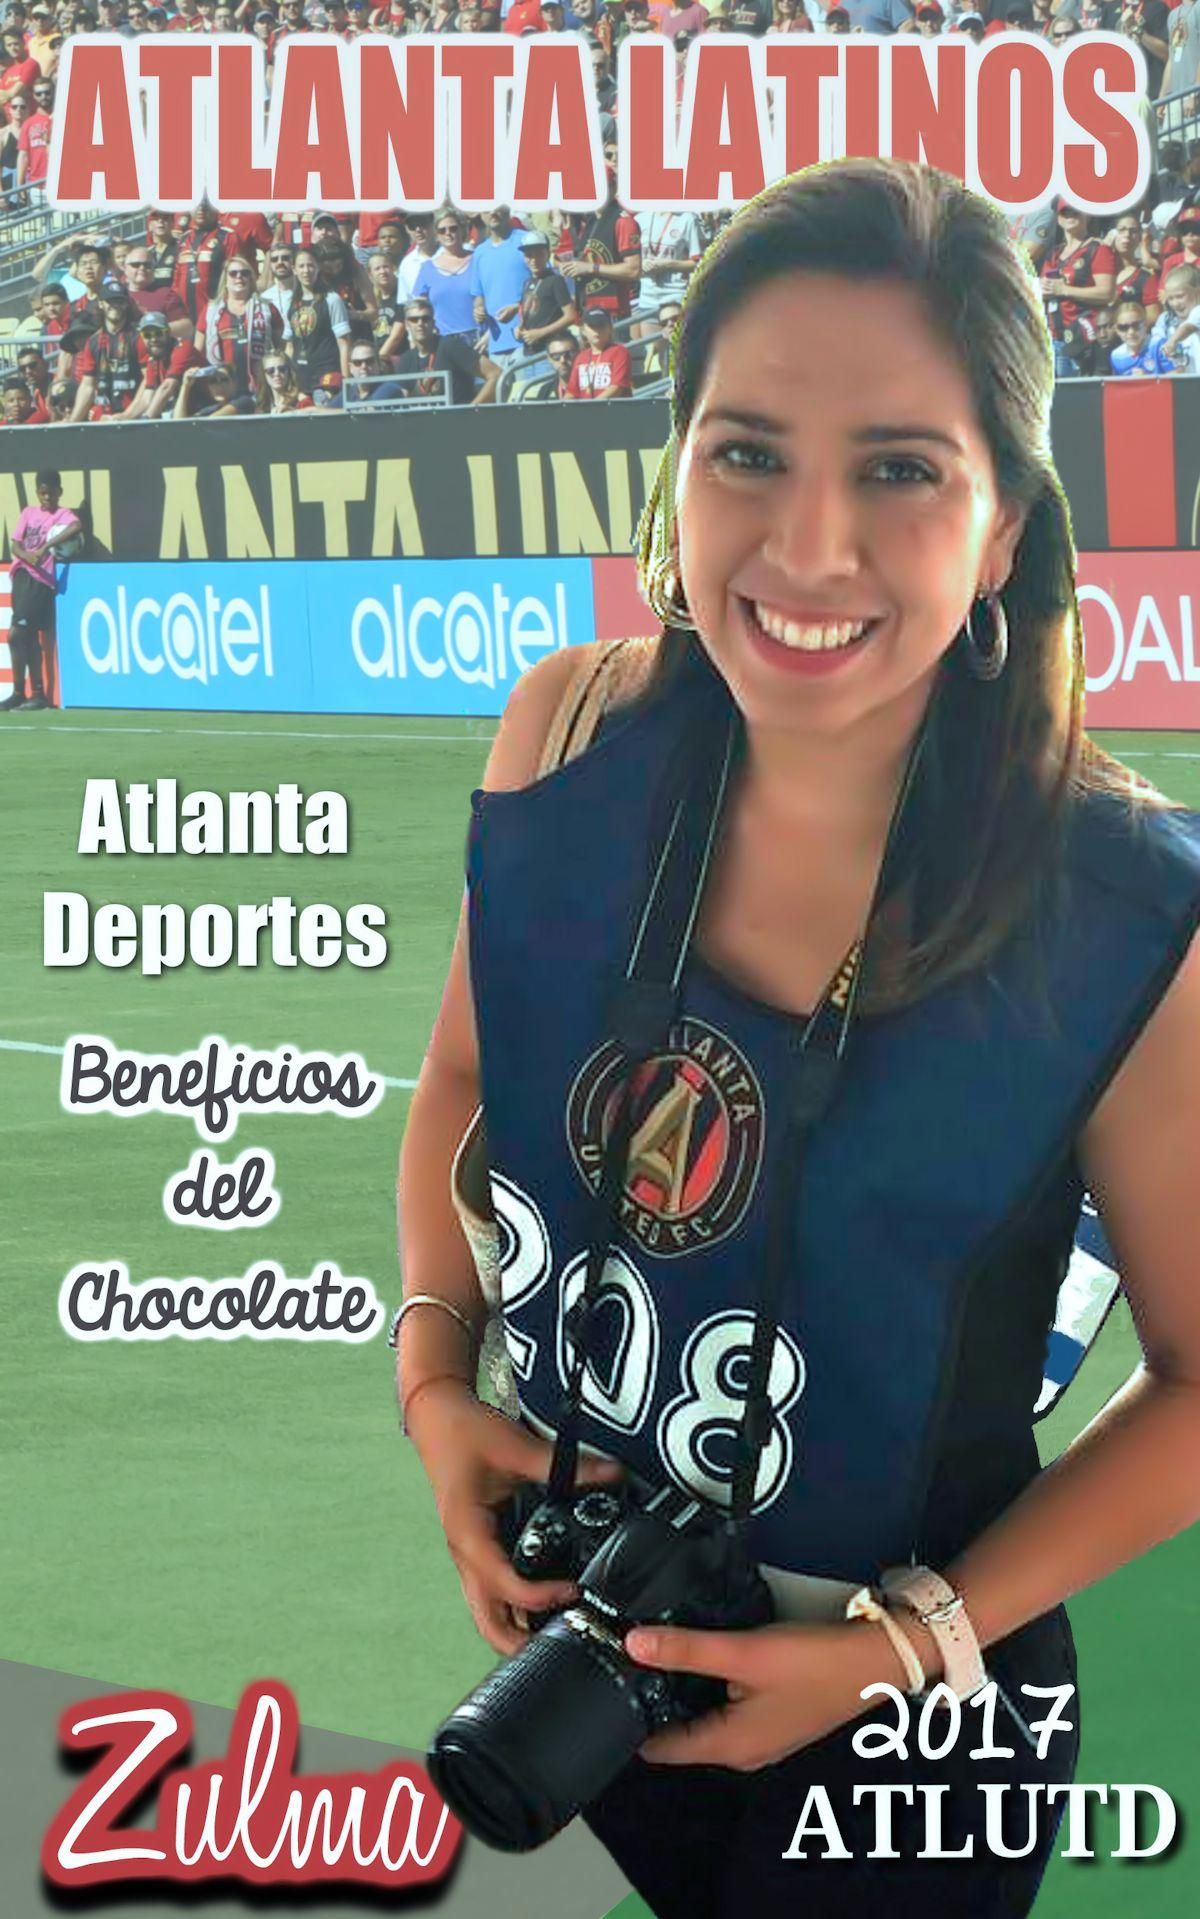 atlanta-zulma-owens-photographer-atlanta-latinos-deportes